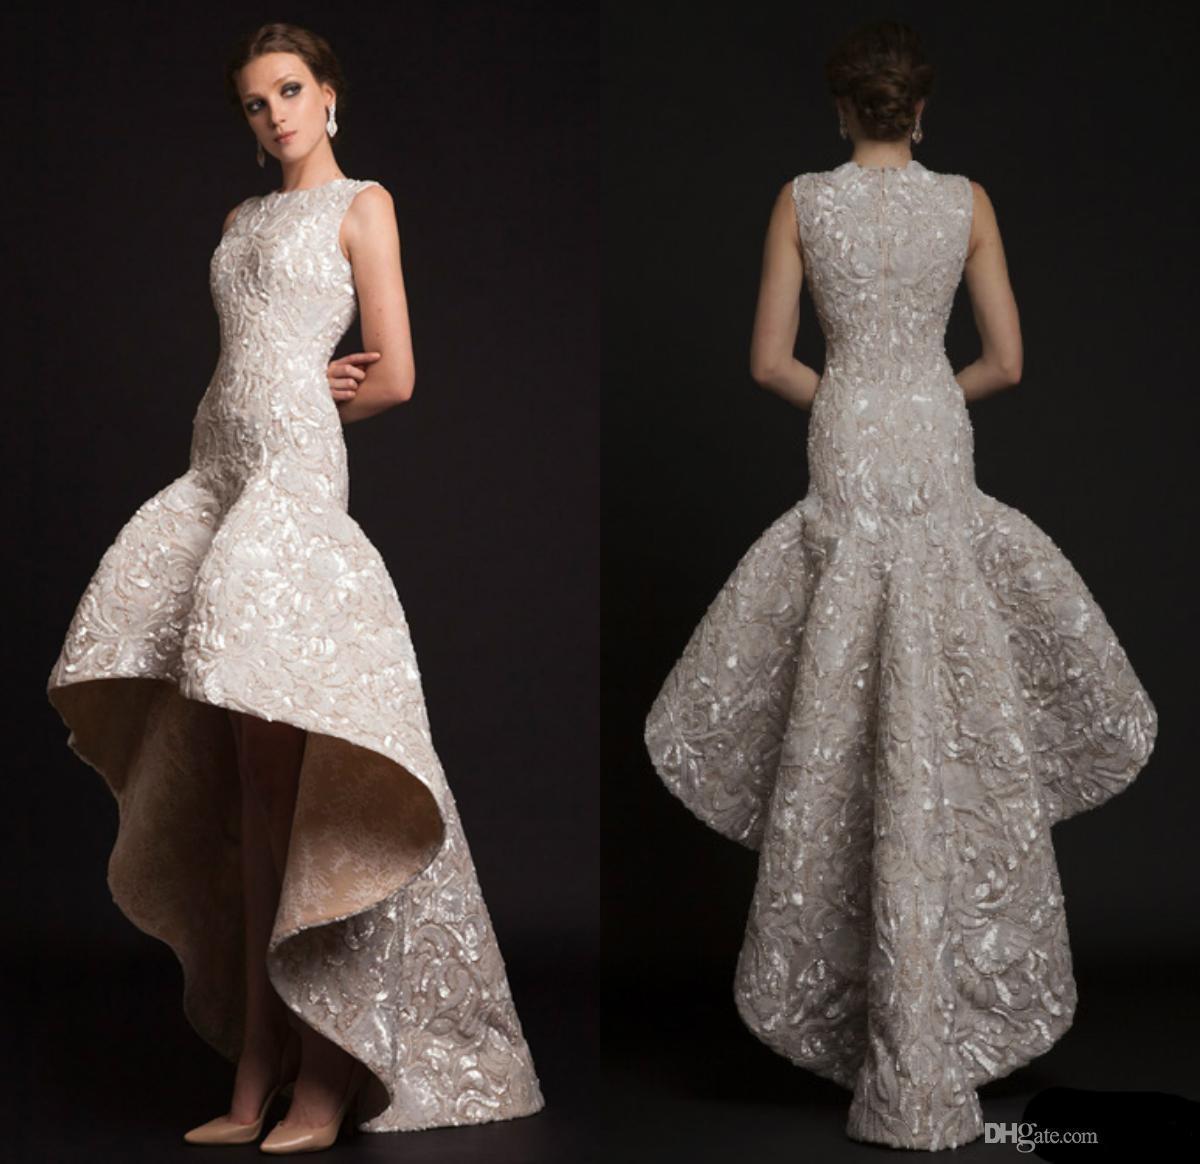 79d52fa7c15 2019 New Arrival Krikor Jabotian Luxury Evening Dresses Jewel High Low  Mermaid Sleeveless Formal Party Dress Abendkleider Prom Gowns Evening  Dresses Plus ...